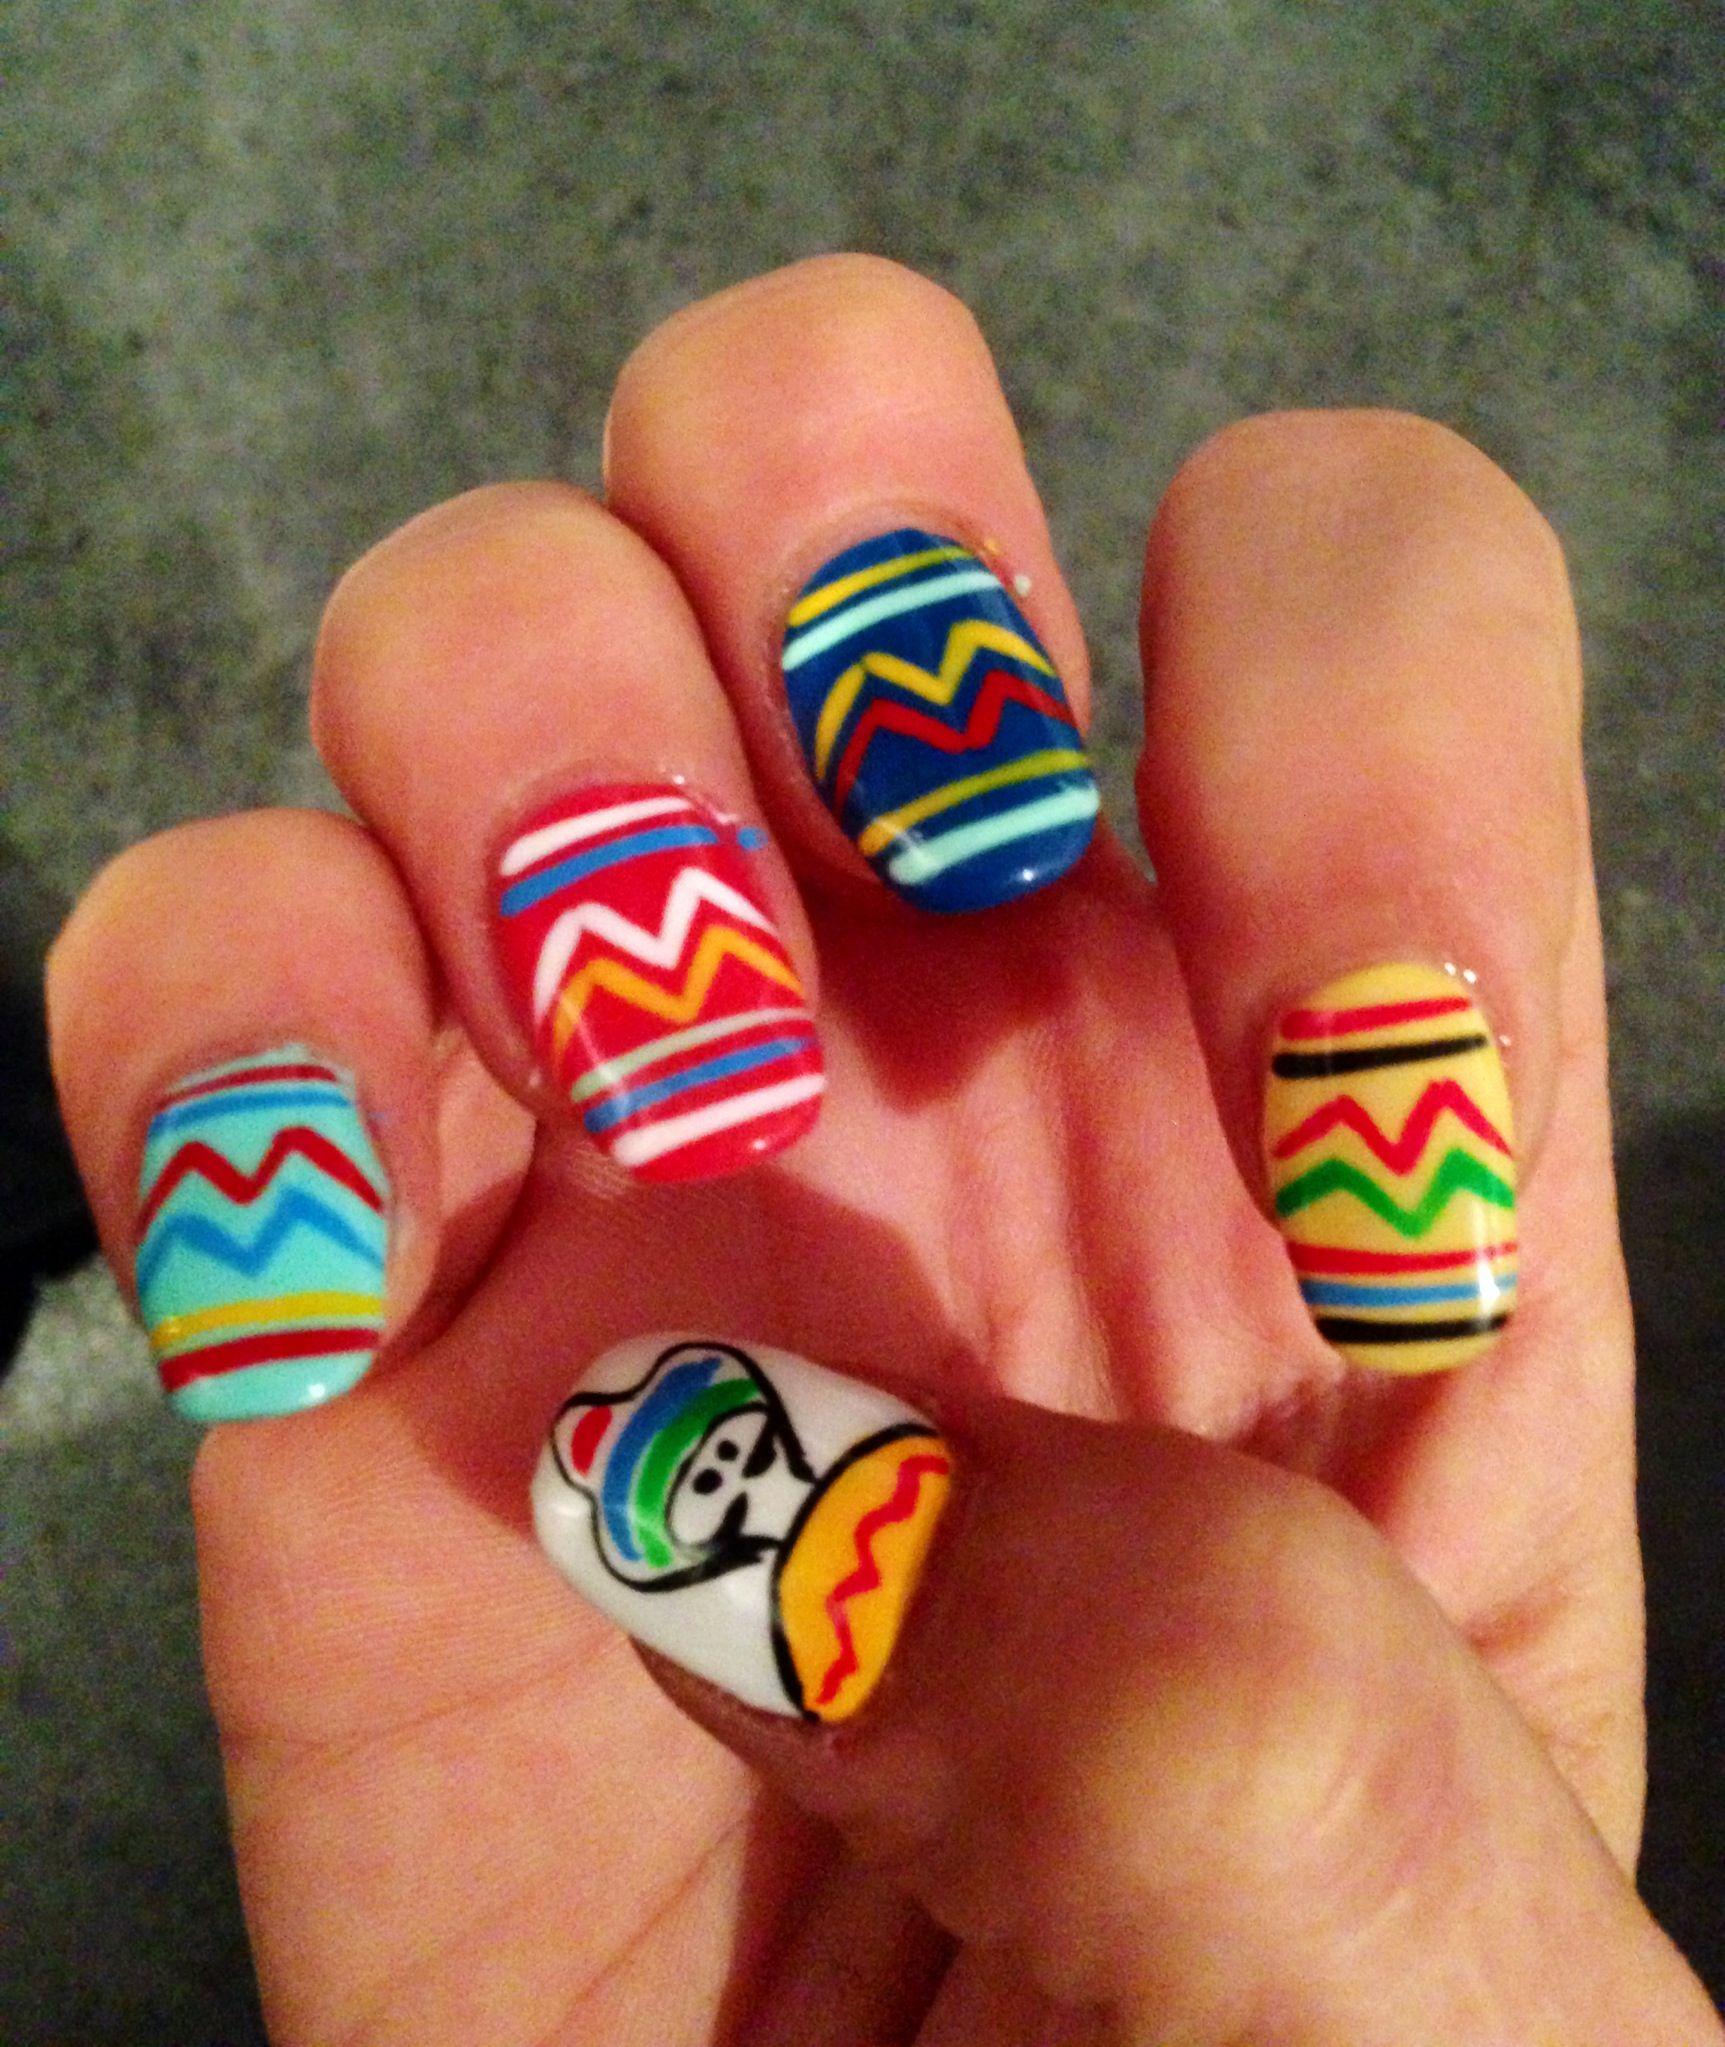 Mexican nail art | Nail design | Pinterest | Divertido, Cerámica y ...